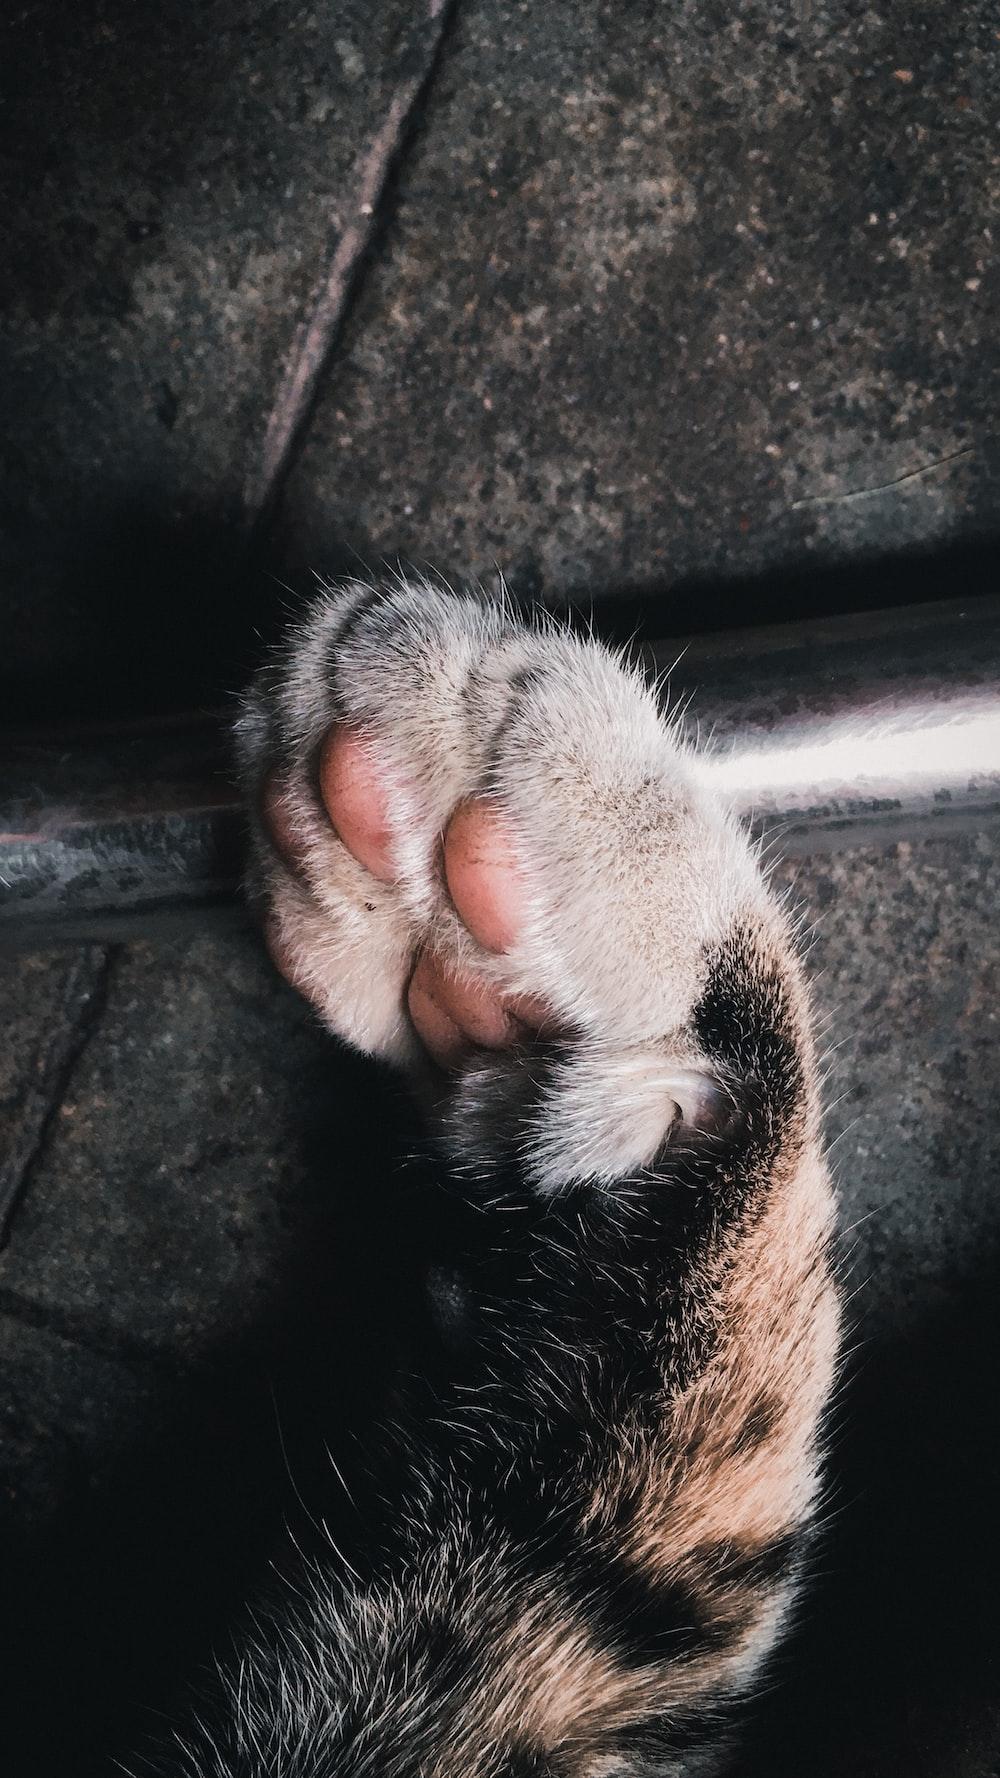 brown tabby cat paw on black concrete floor